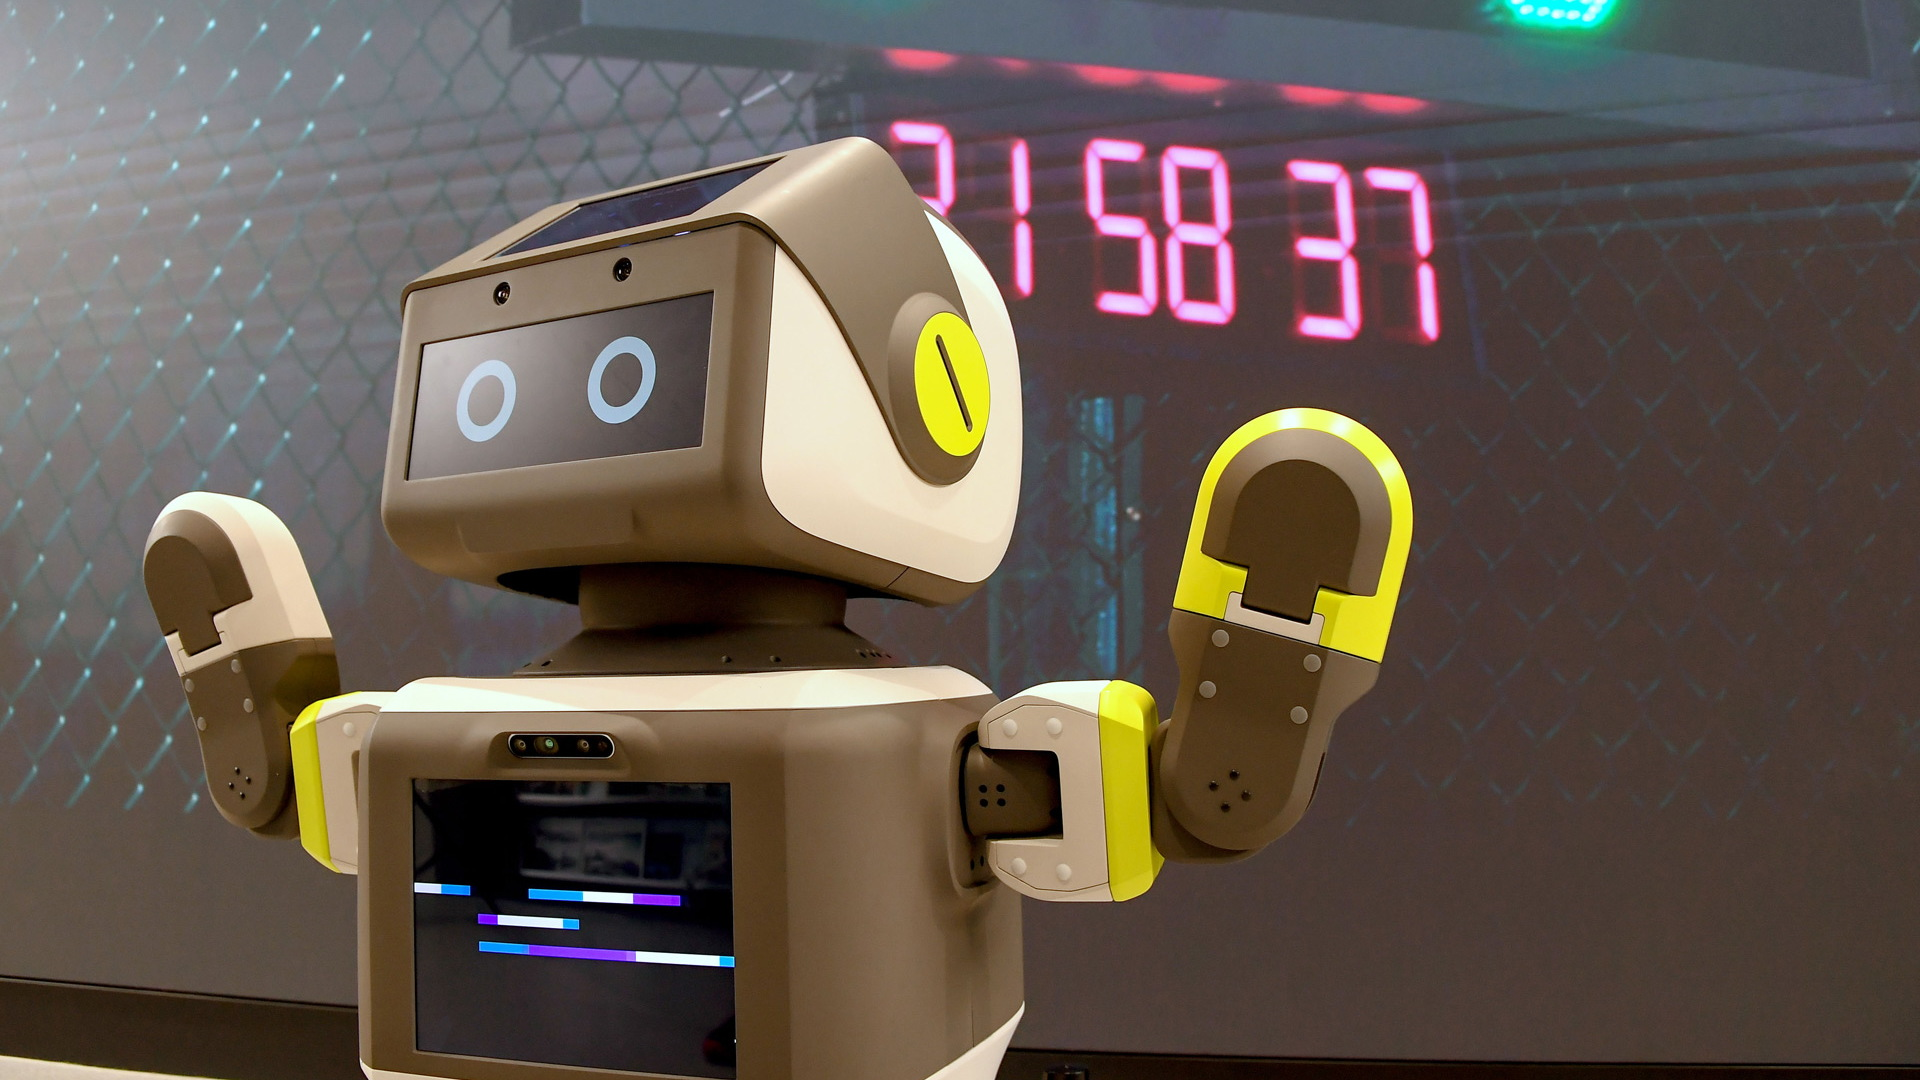 Hyundai Motor Group DAL-e robot assistant